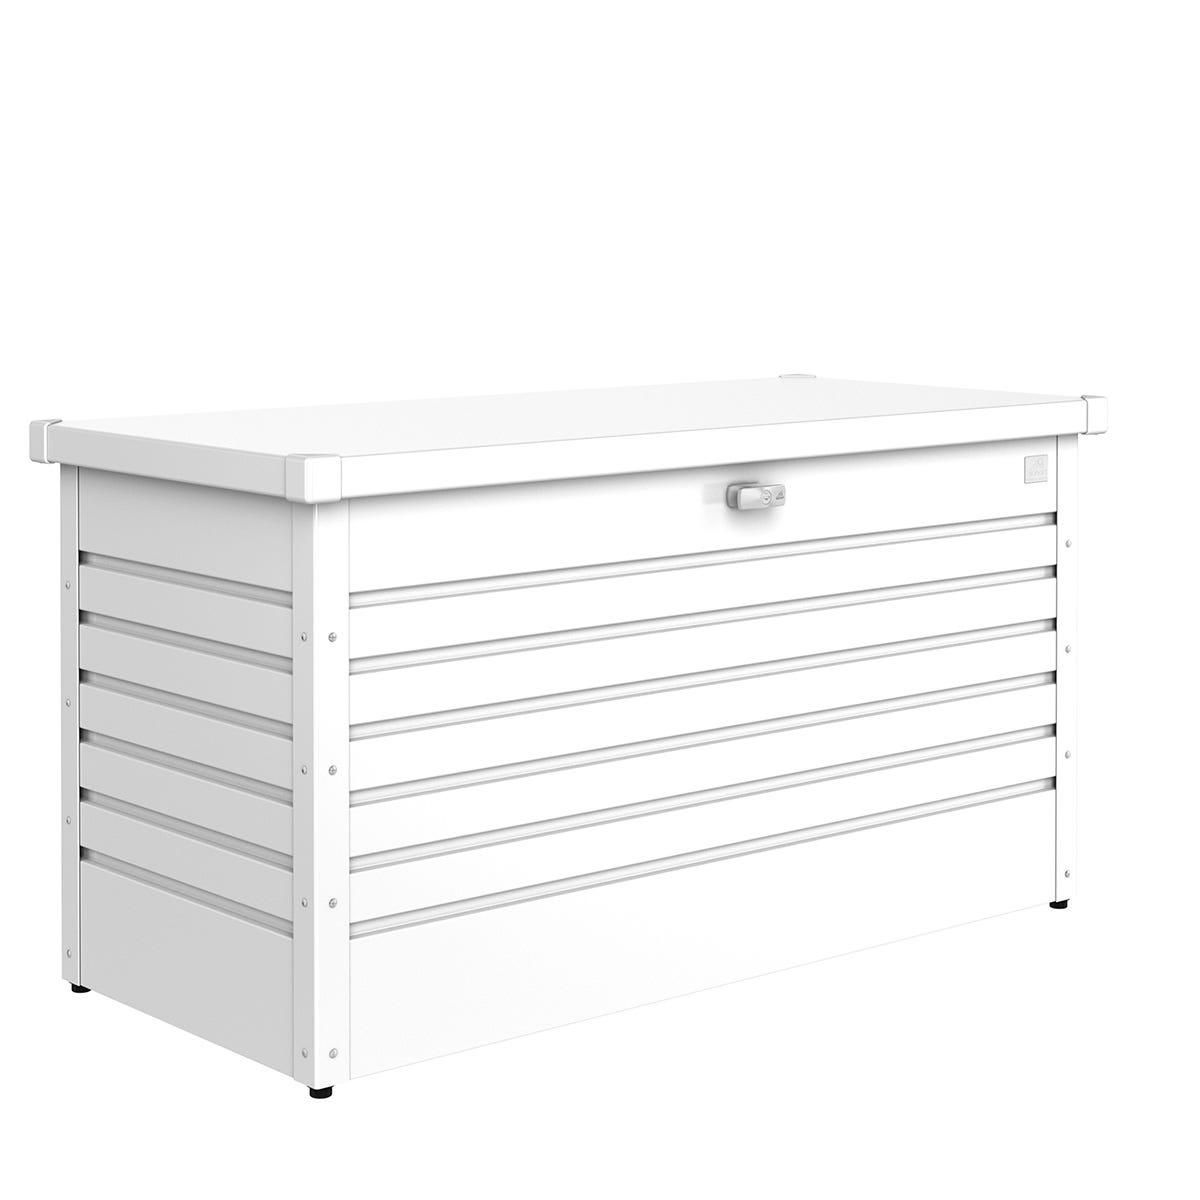 Biohort LeisureTime 4' x 2' Storage Box 130 - White